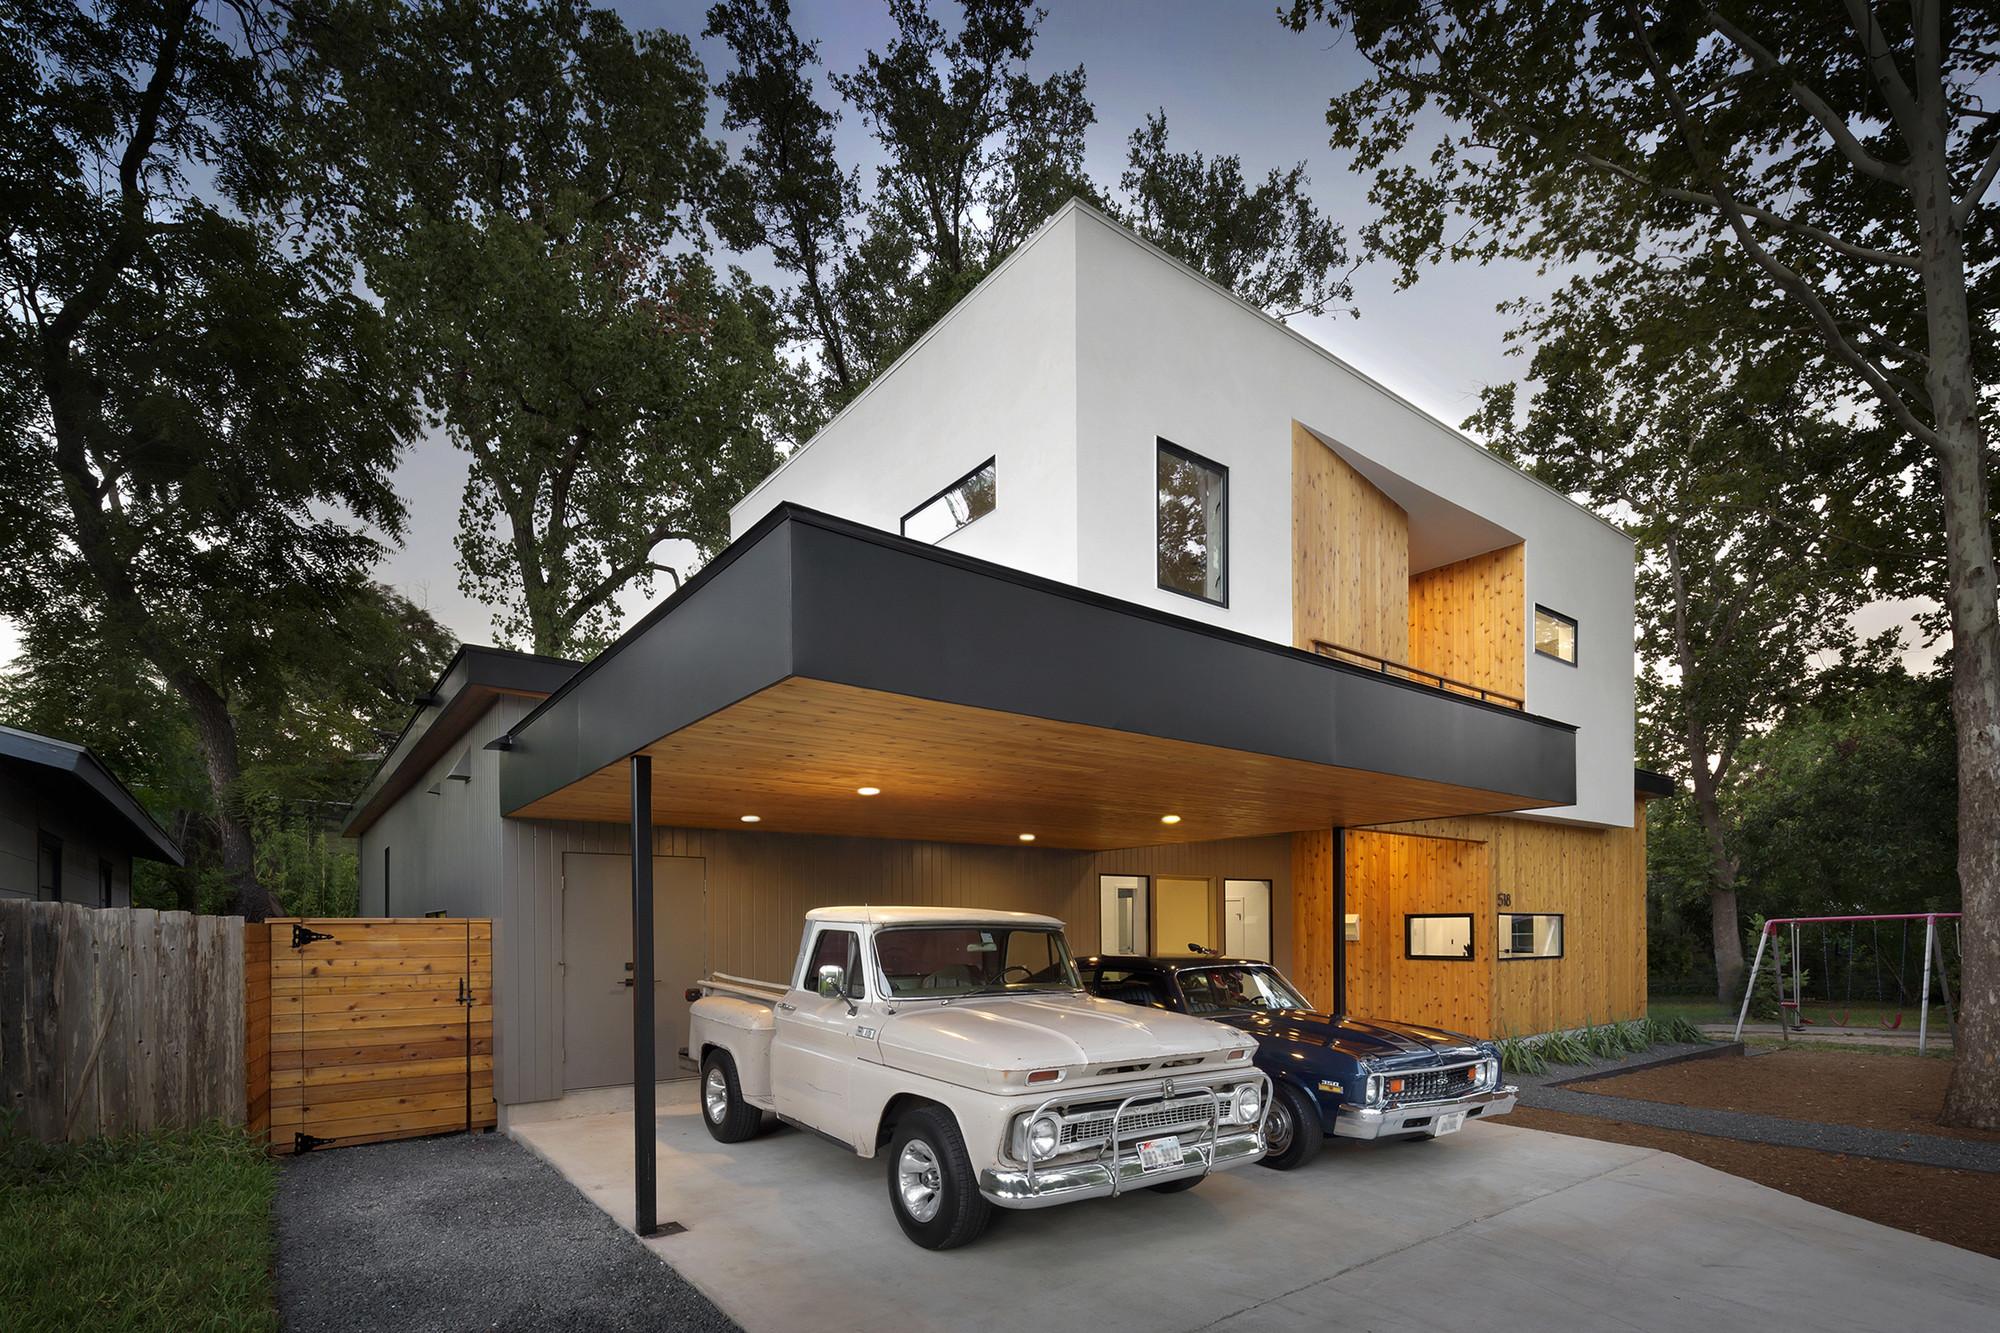 Tree house by matt fajkus architecture in austin texas for Austin house